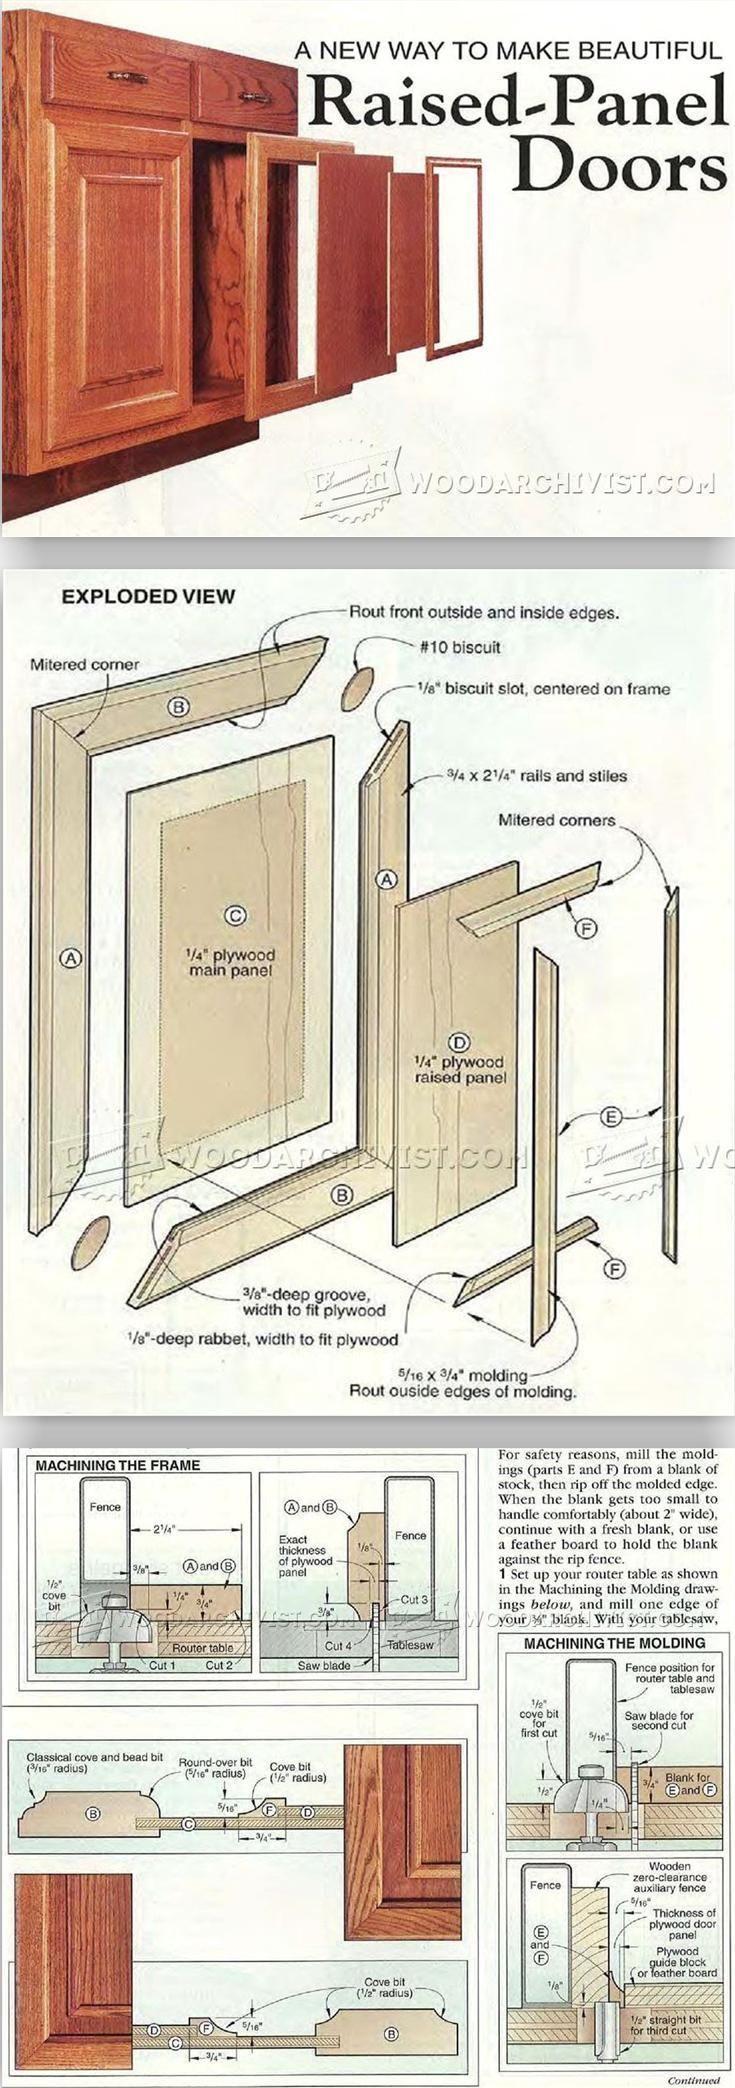 Making Raised Panel Doors Cabinet Door Construction And Techniques